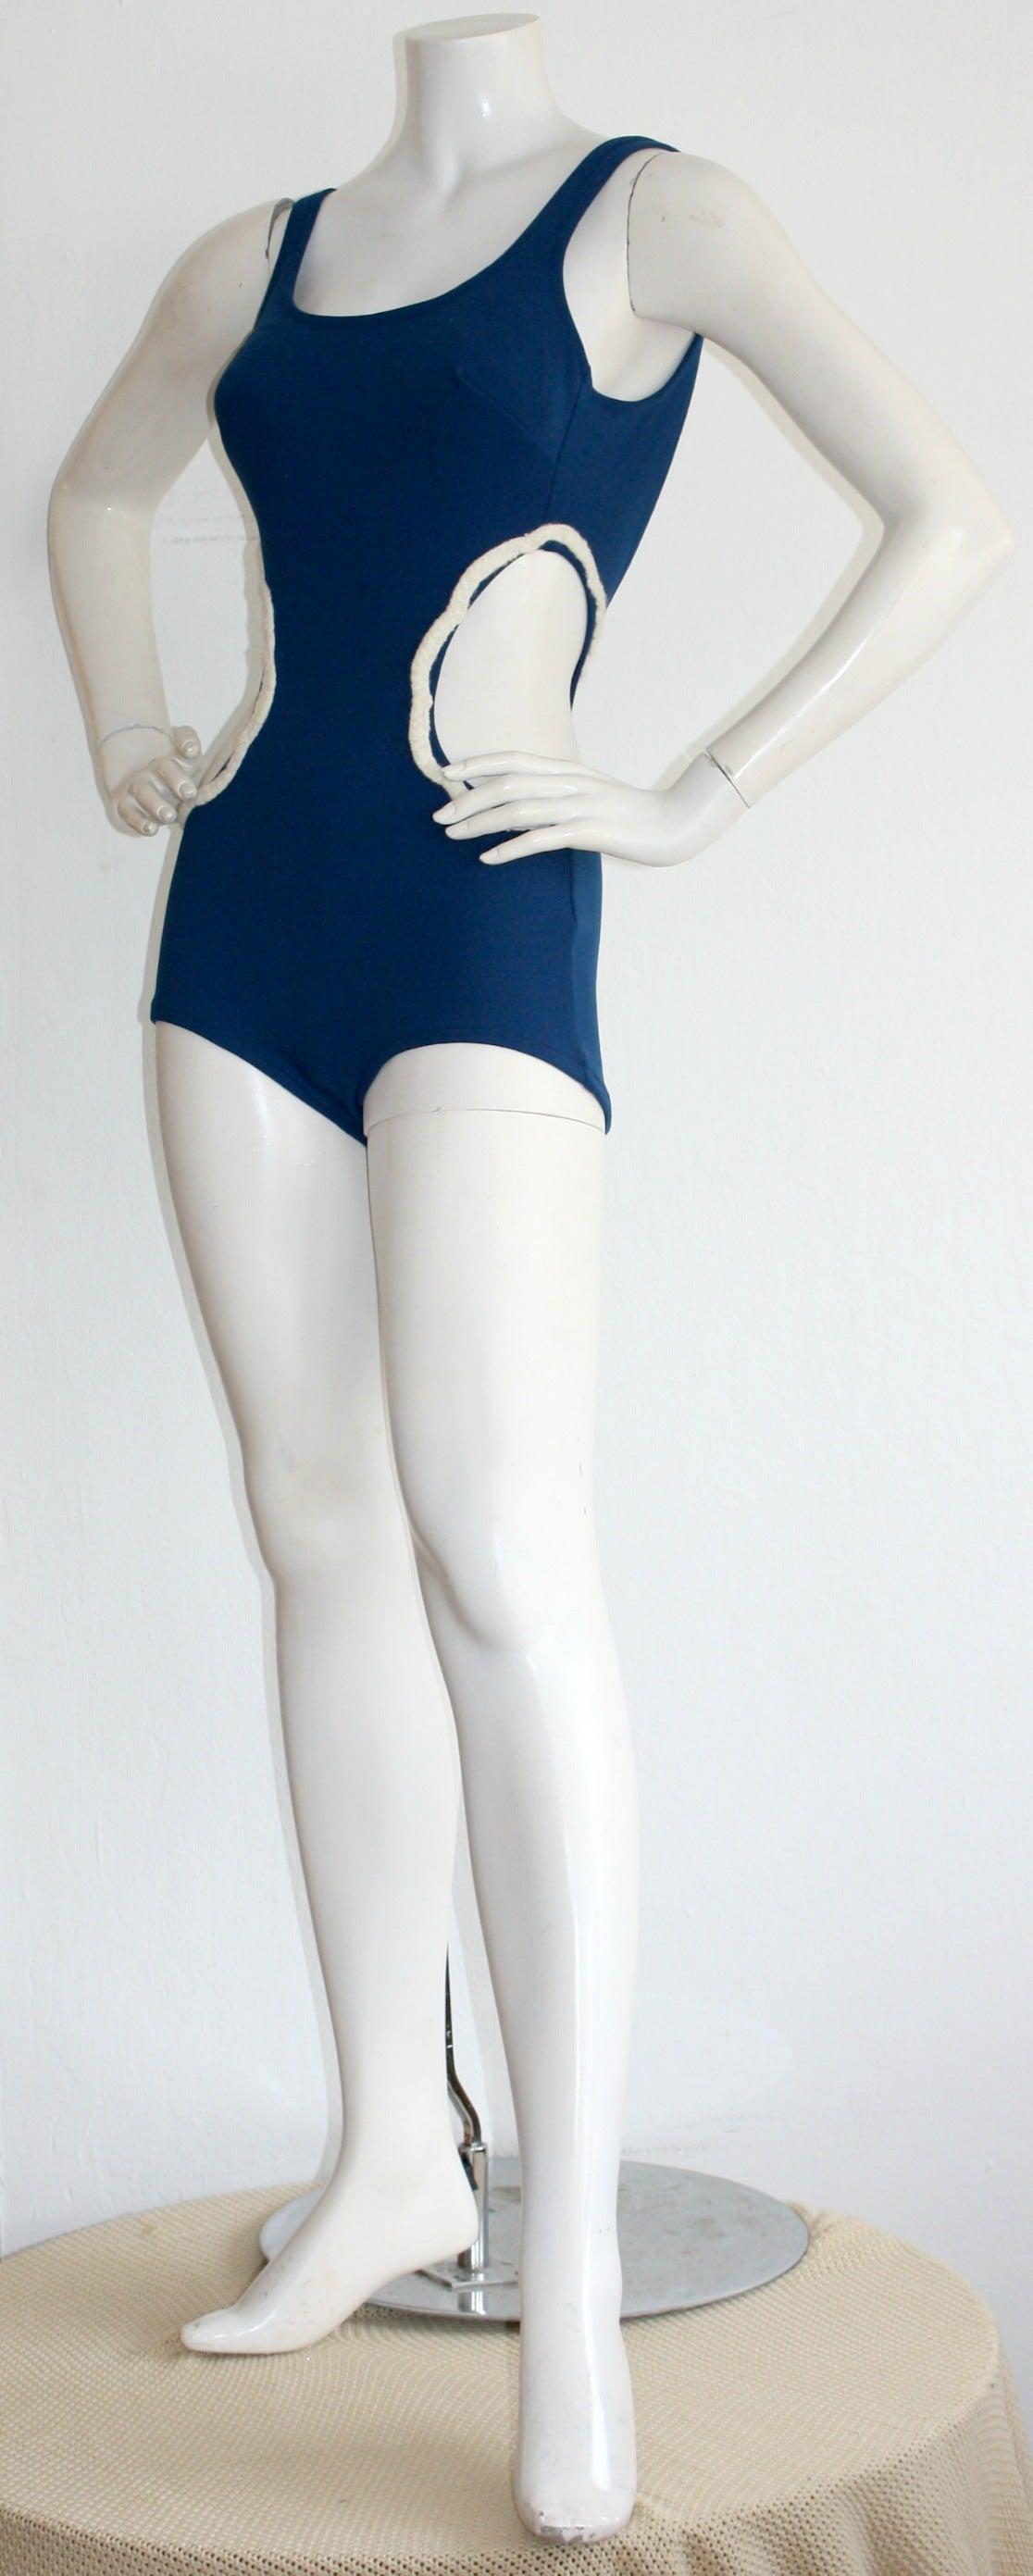 Purple 1960s Vintage Oleg Cassini ' Peter Pan ' Space Age Cut-Out Swimsuit For Sale